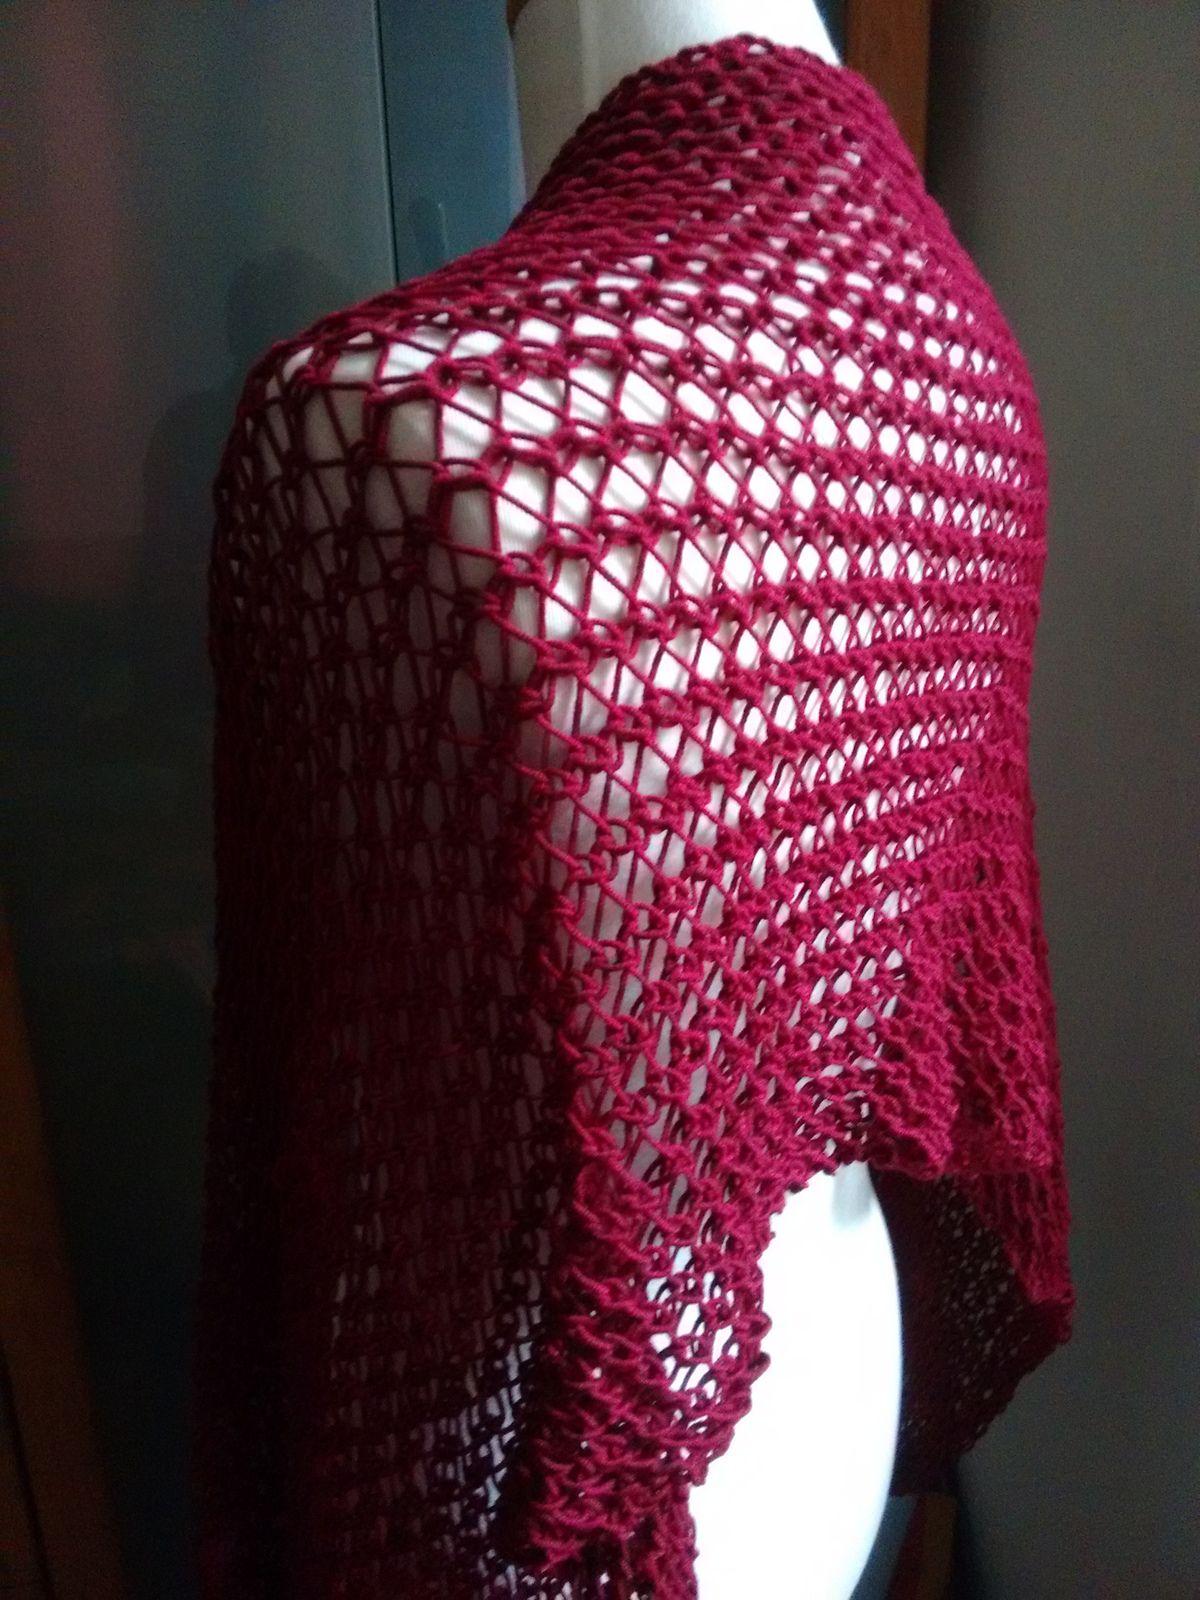 Ravelry: 100 grammi by Cristiana Brenna | Knitting ideas by Tyra ...